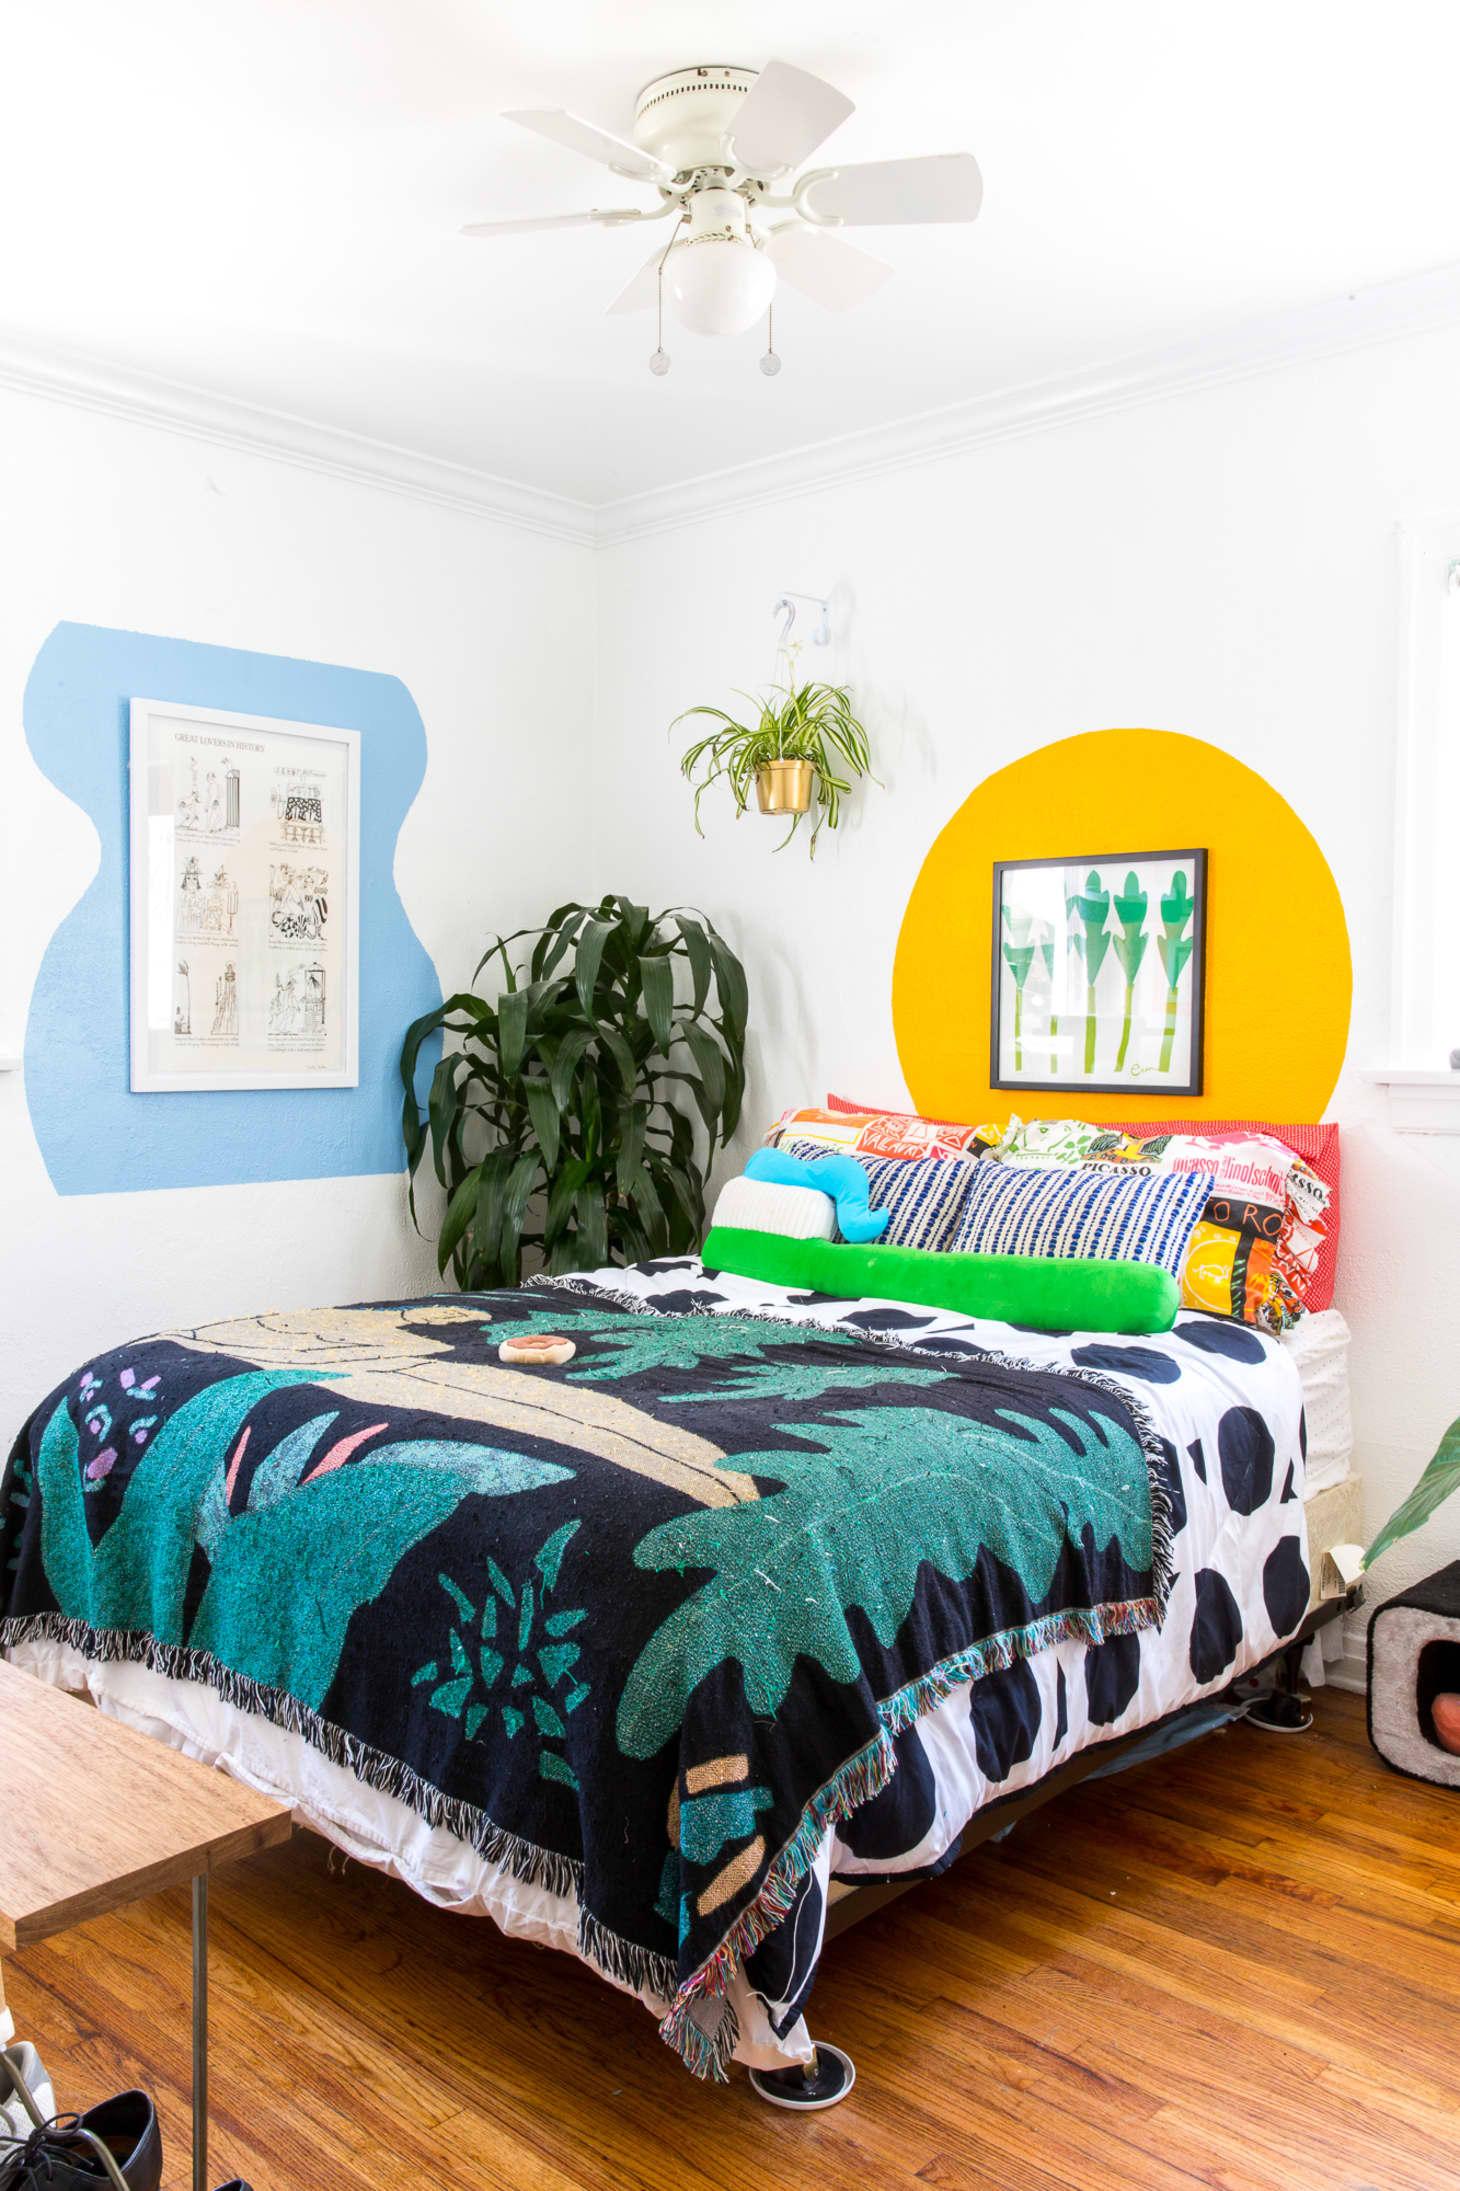 Room Decor Ideas Bedroom Couple Night Stands